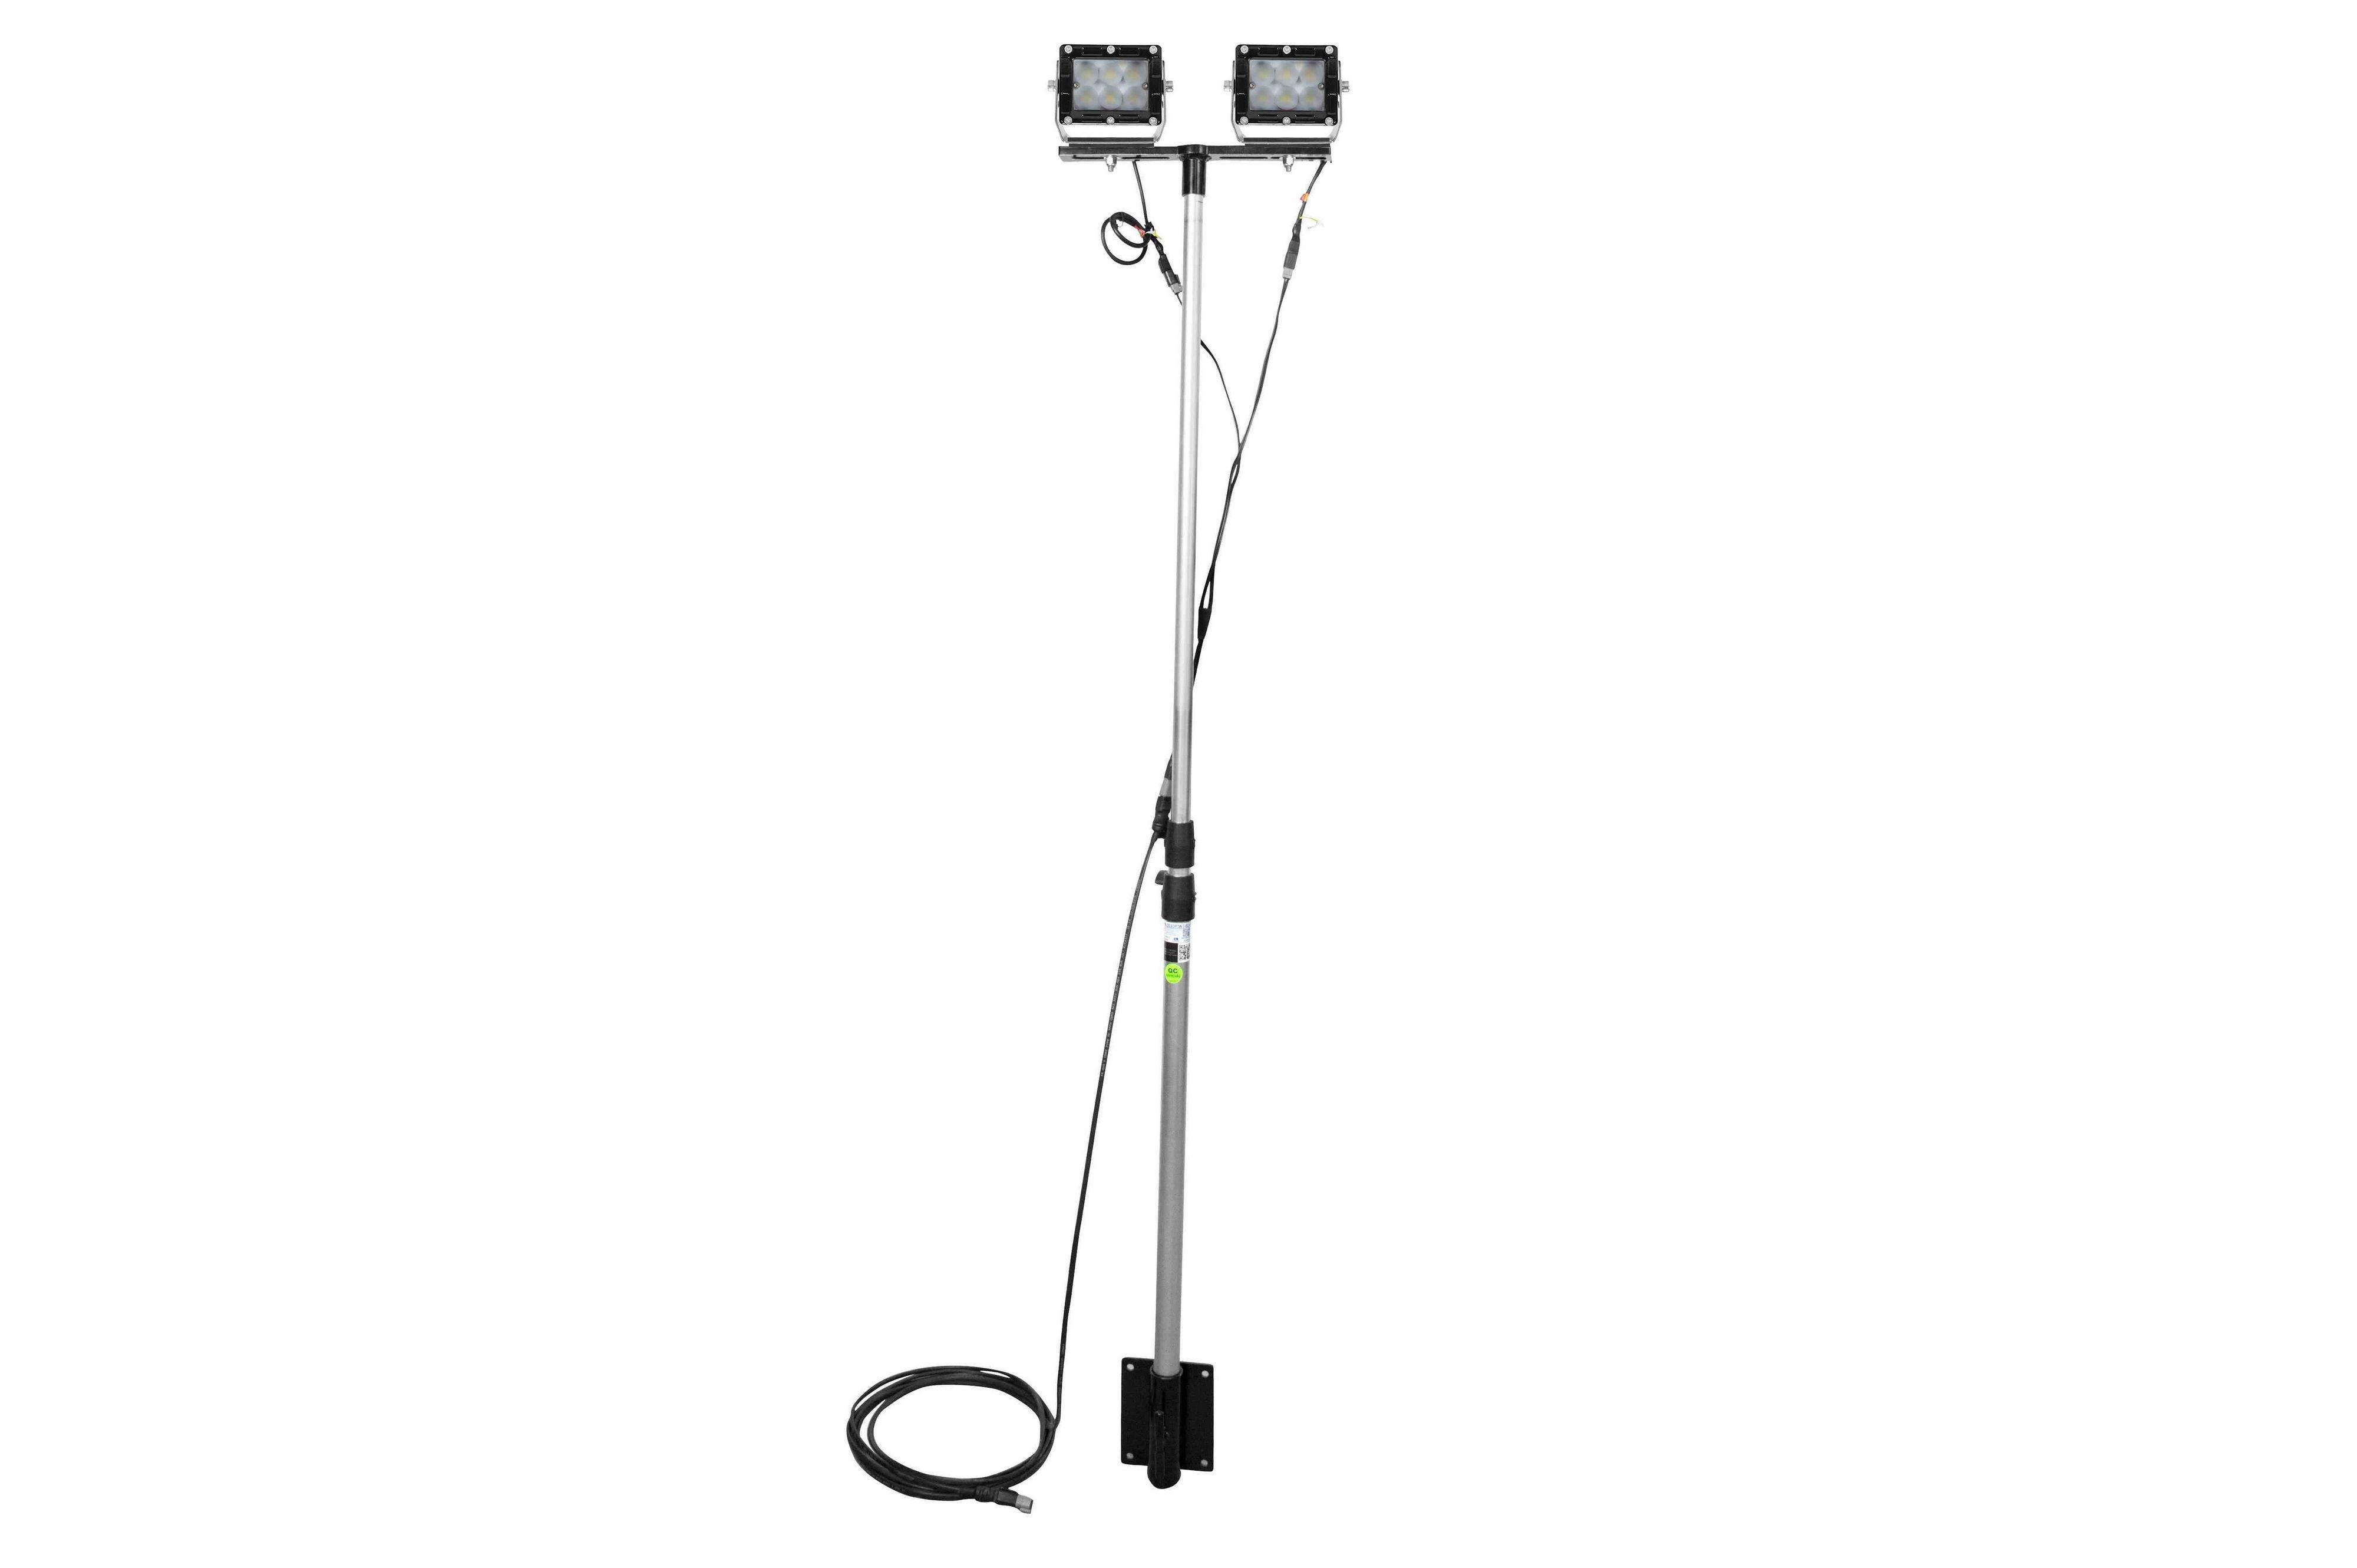 60w led pole light -  2  led lamps